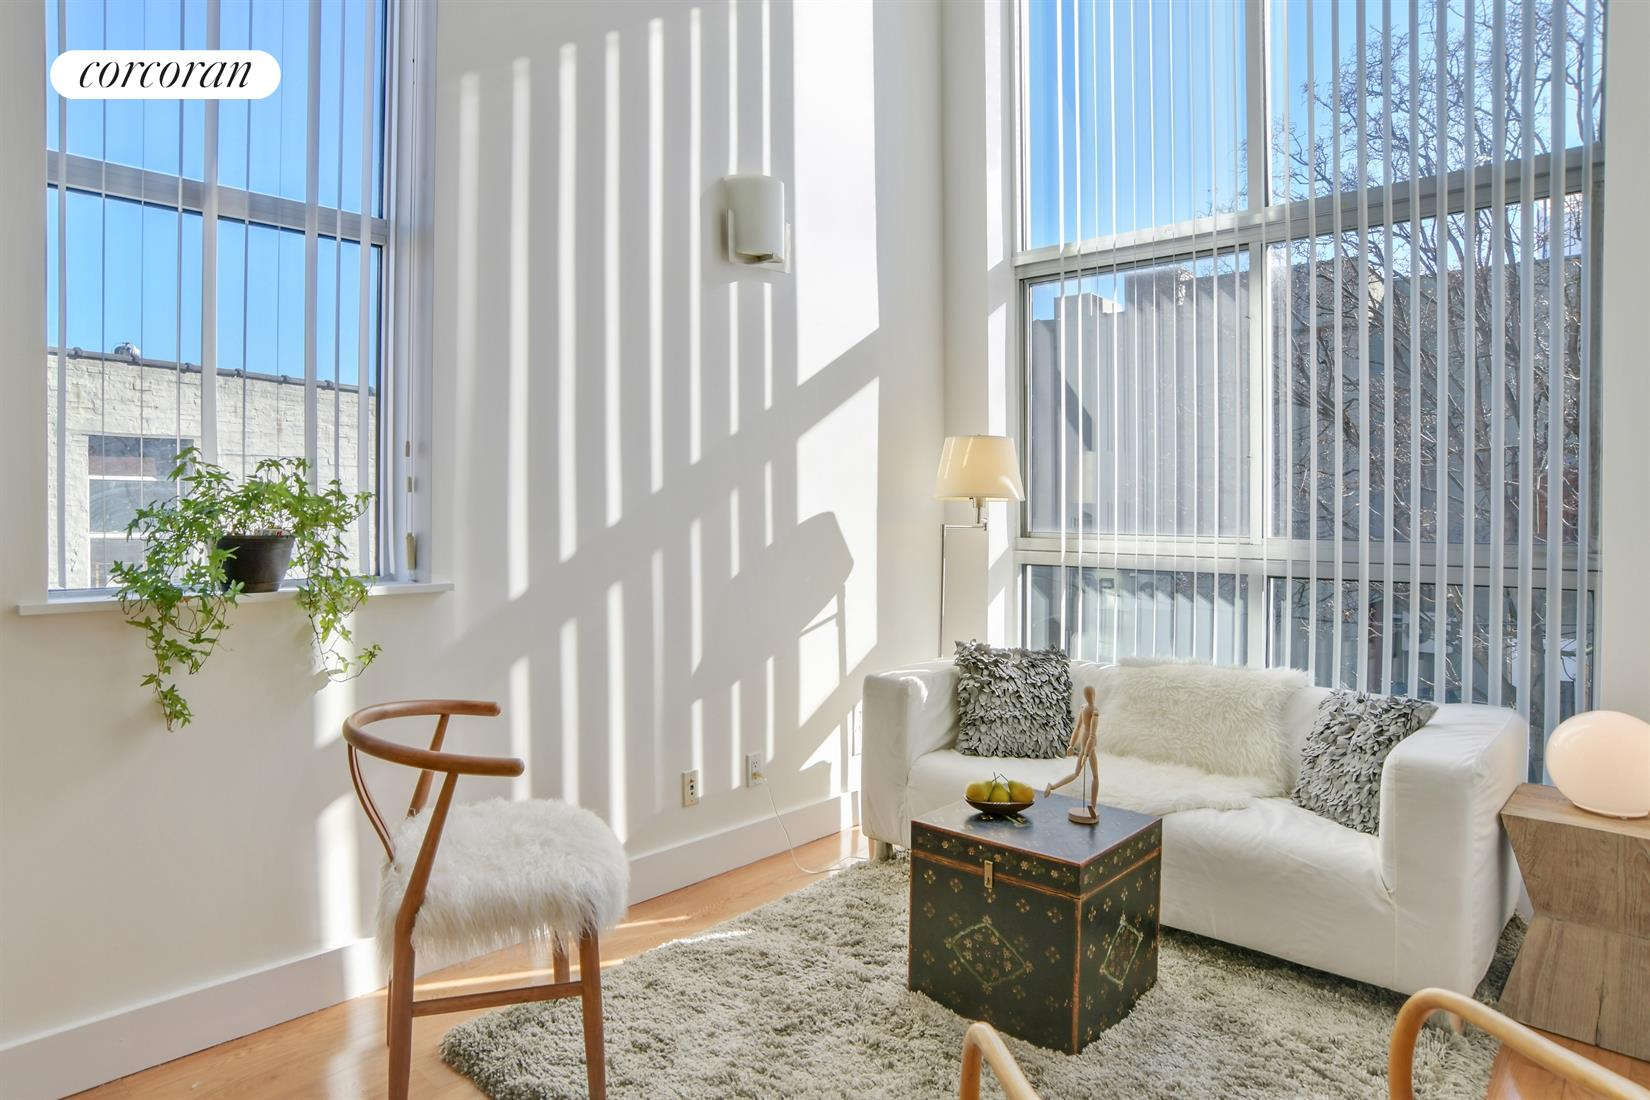 Corcoran, 888 Fulton Street, Apt. 2B, Clinton Hill Real Estate ...